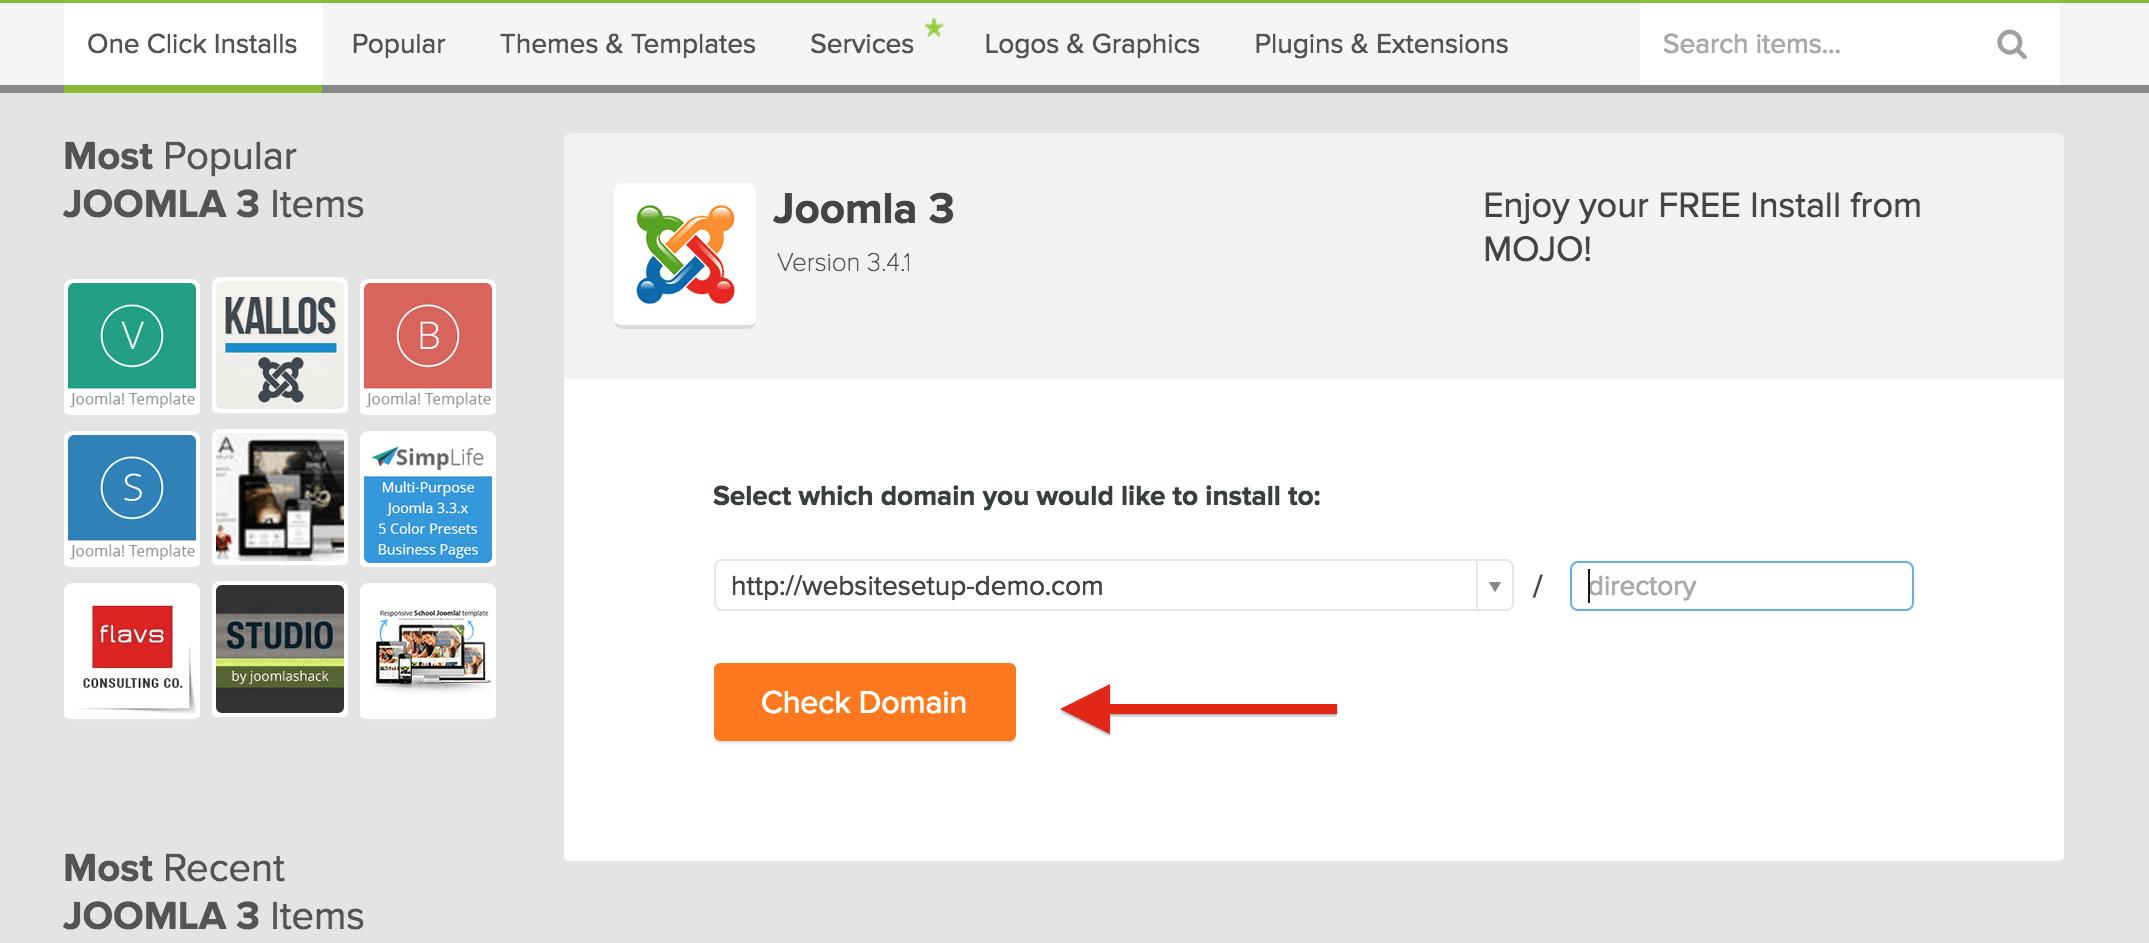 Portal:Beginners - Joomla! Documentation